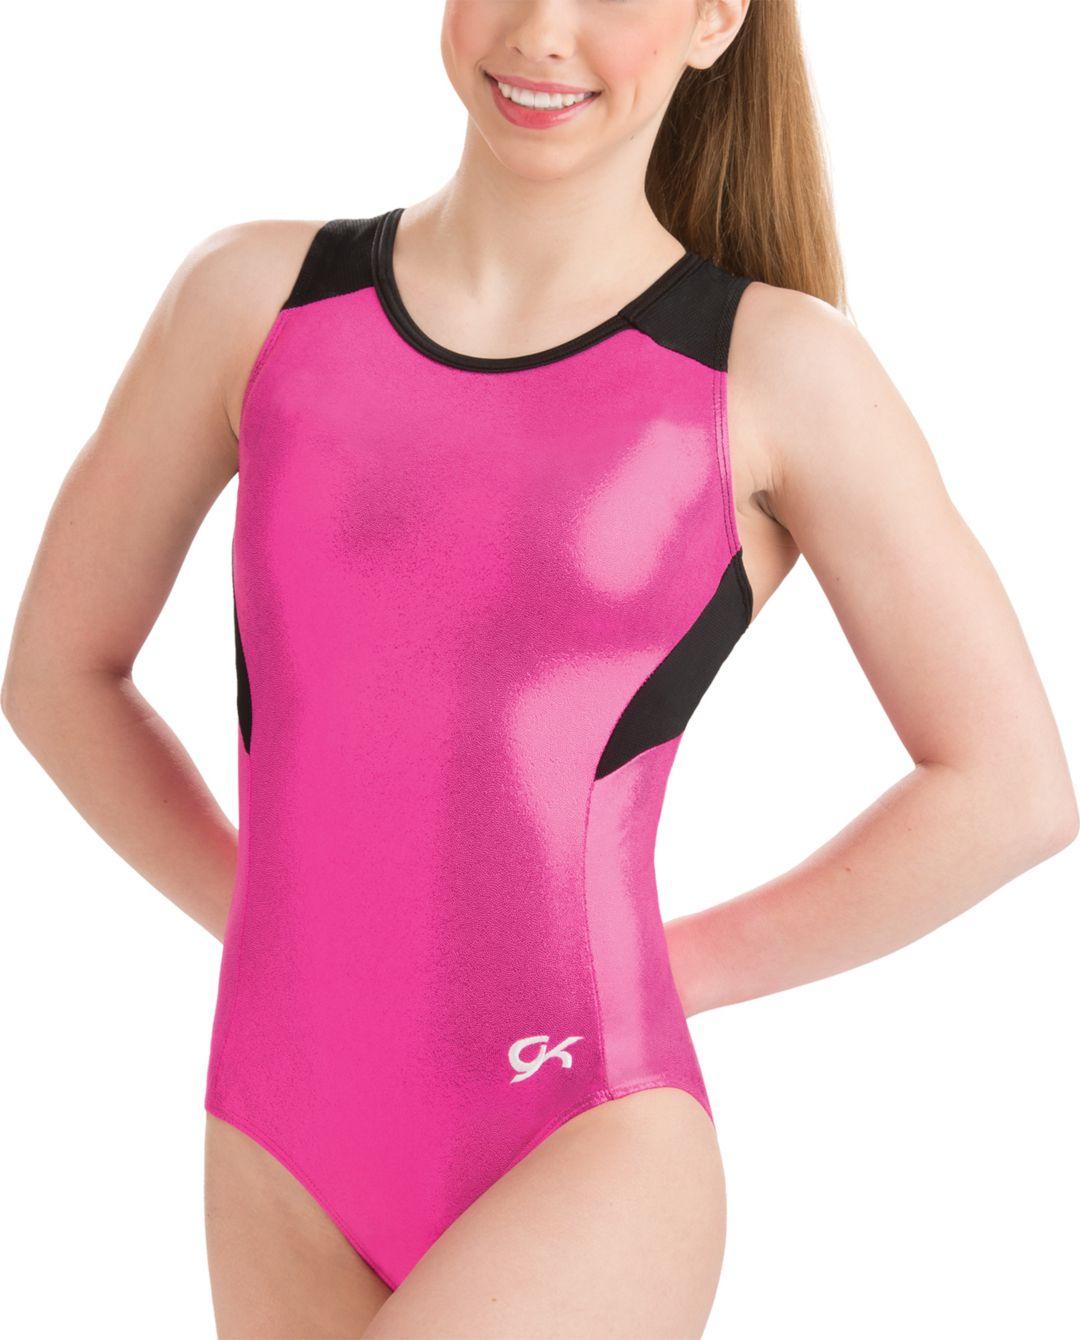 251990363a57 GK Elite Women's Mesh Racerback Gymnastics Leotard   DICK'S Sporting ...